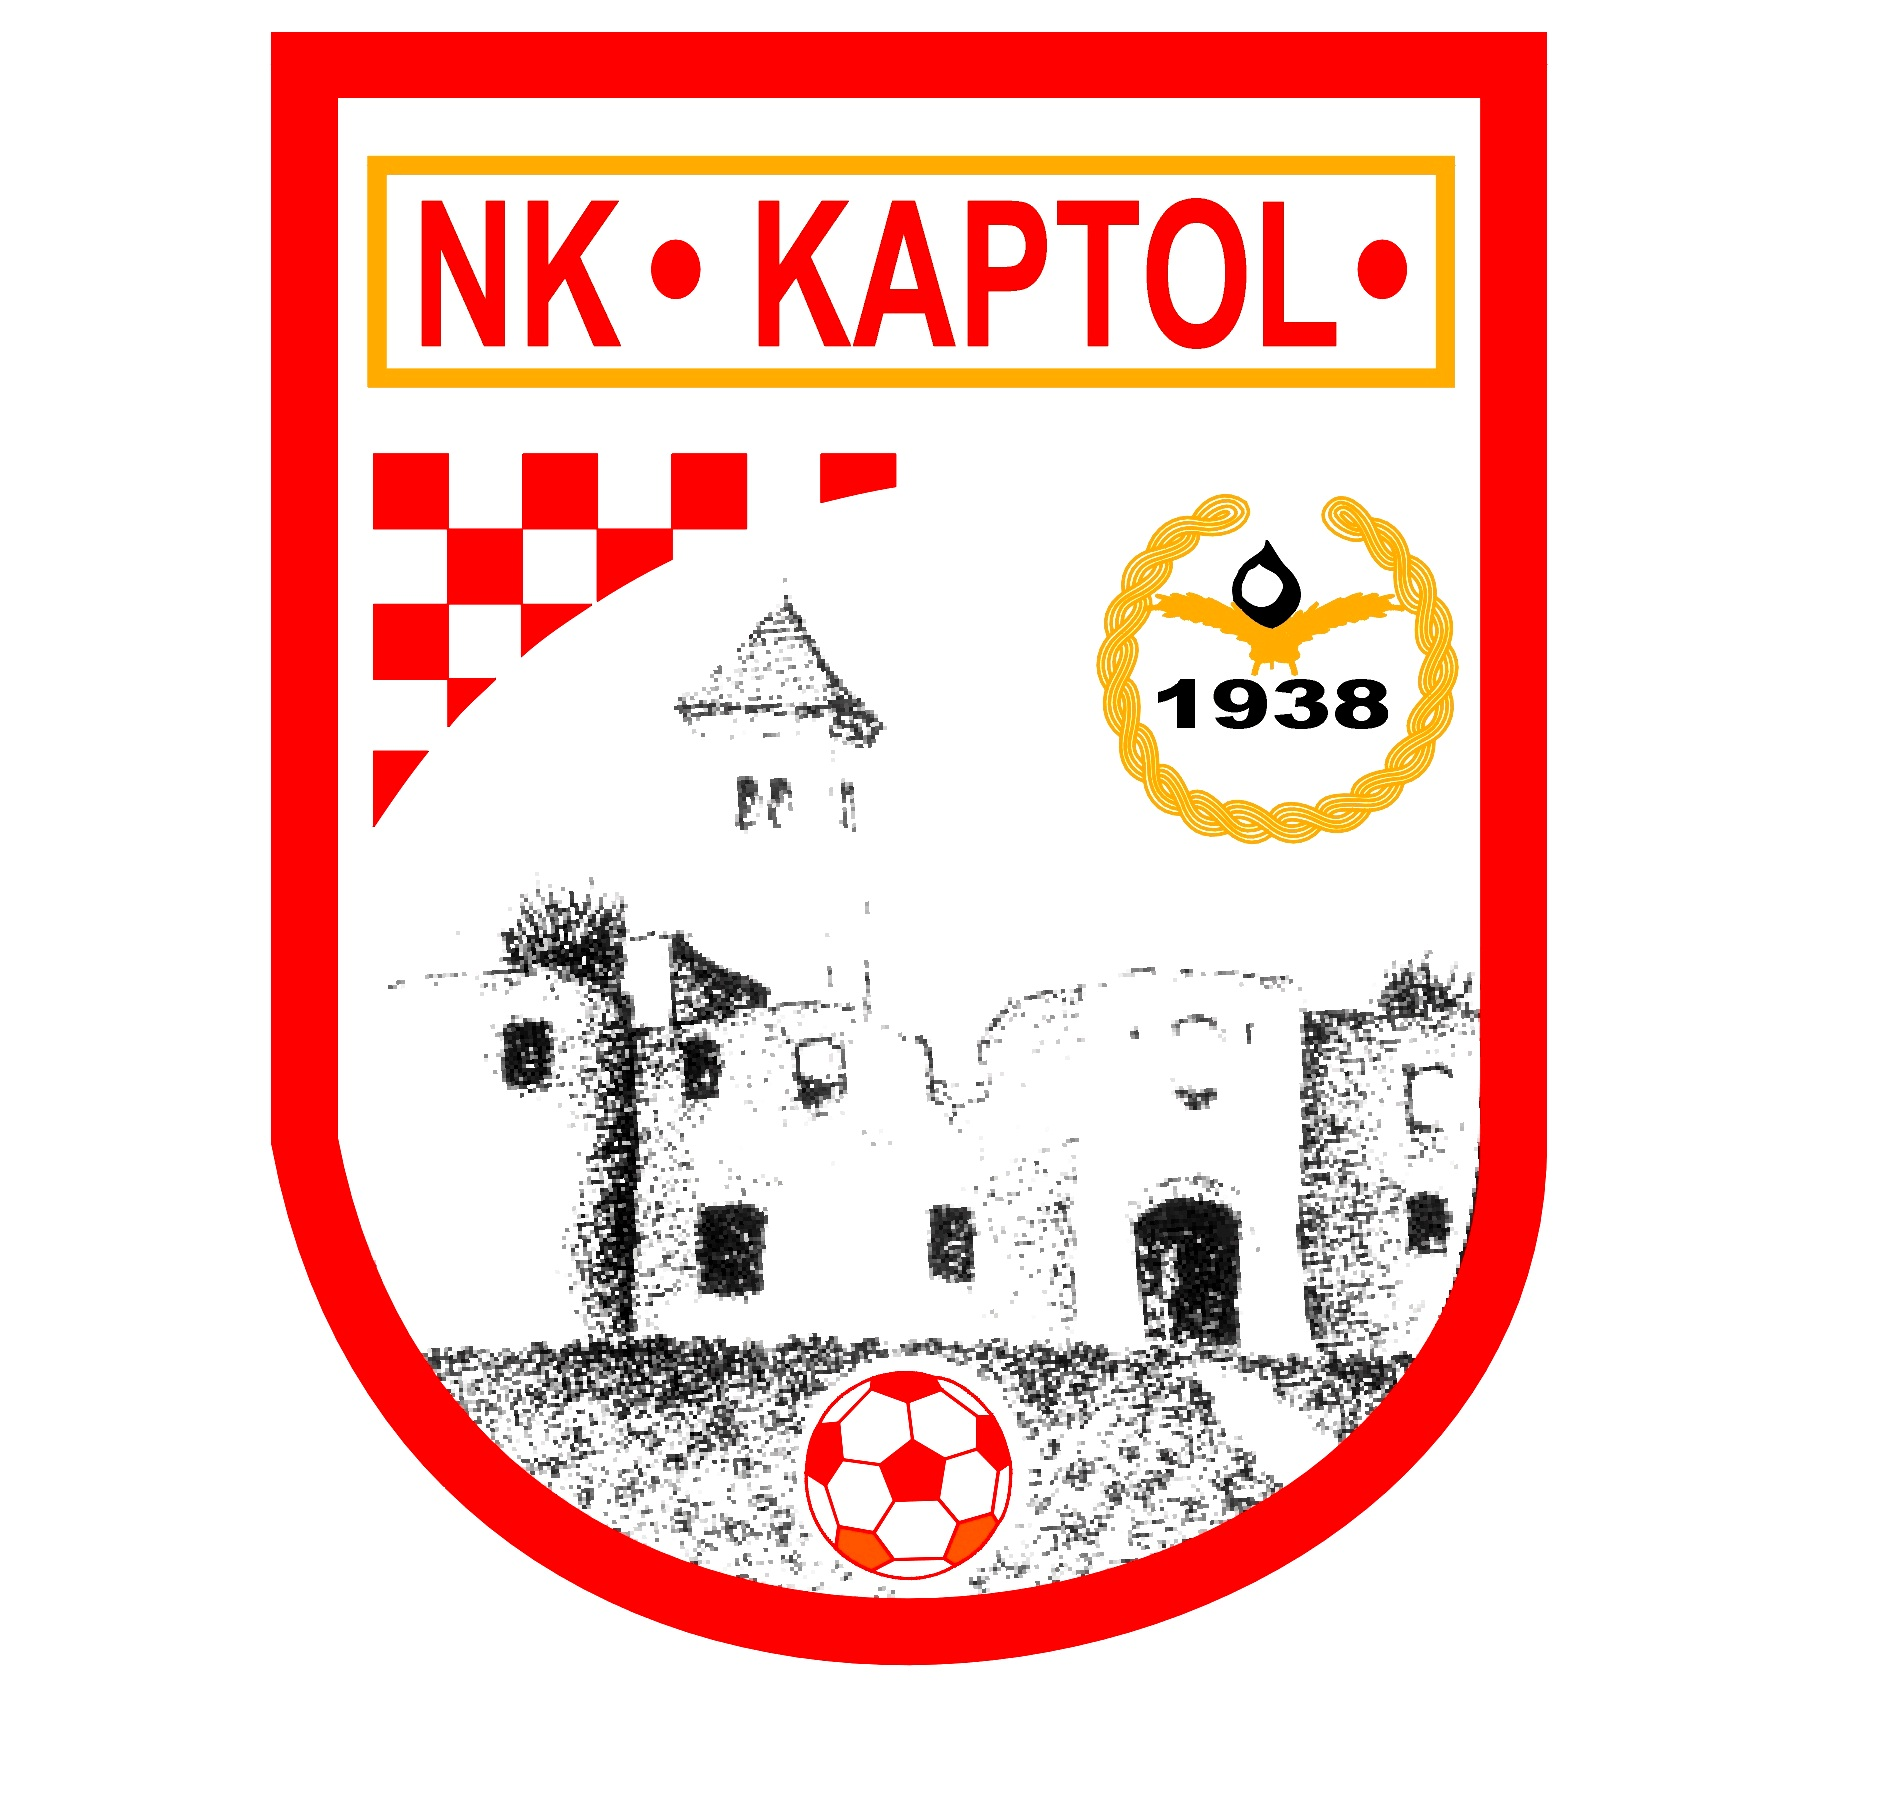 NK Zvijezda Kaptol